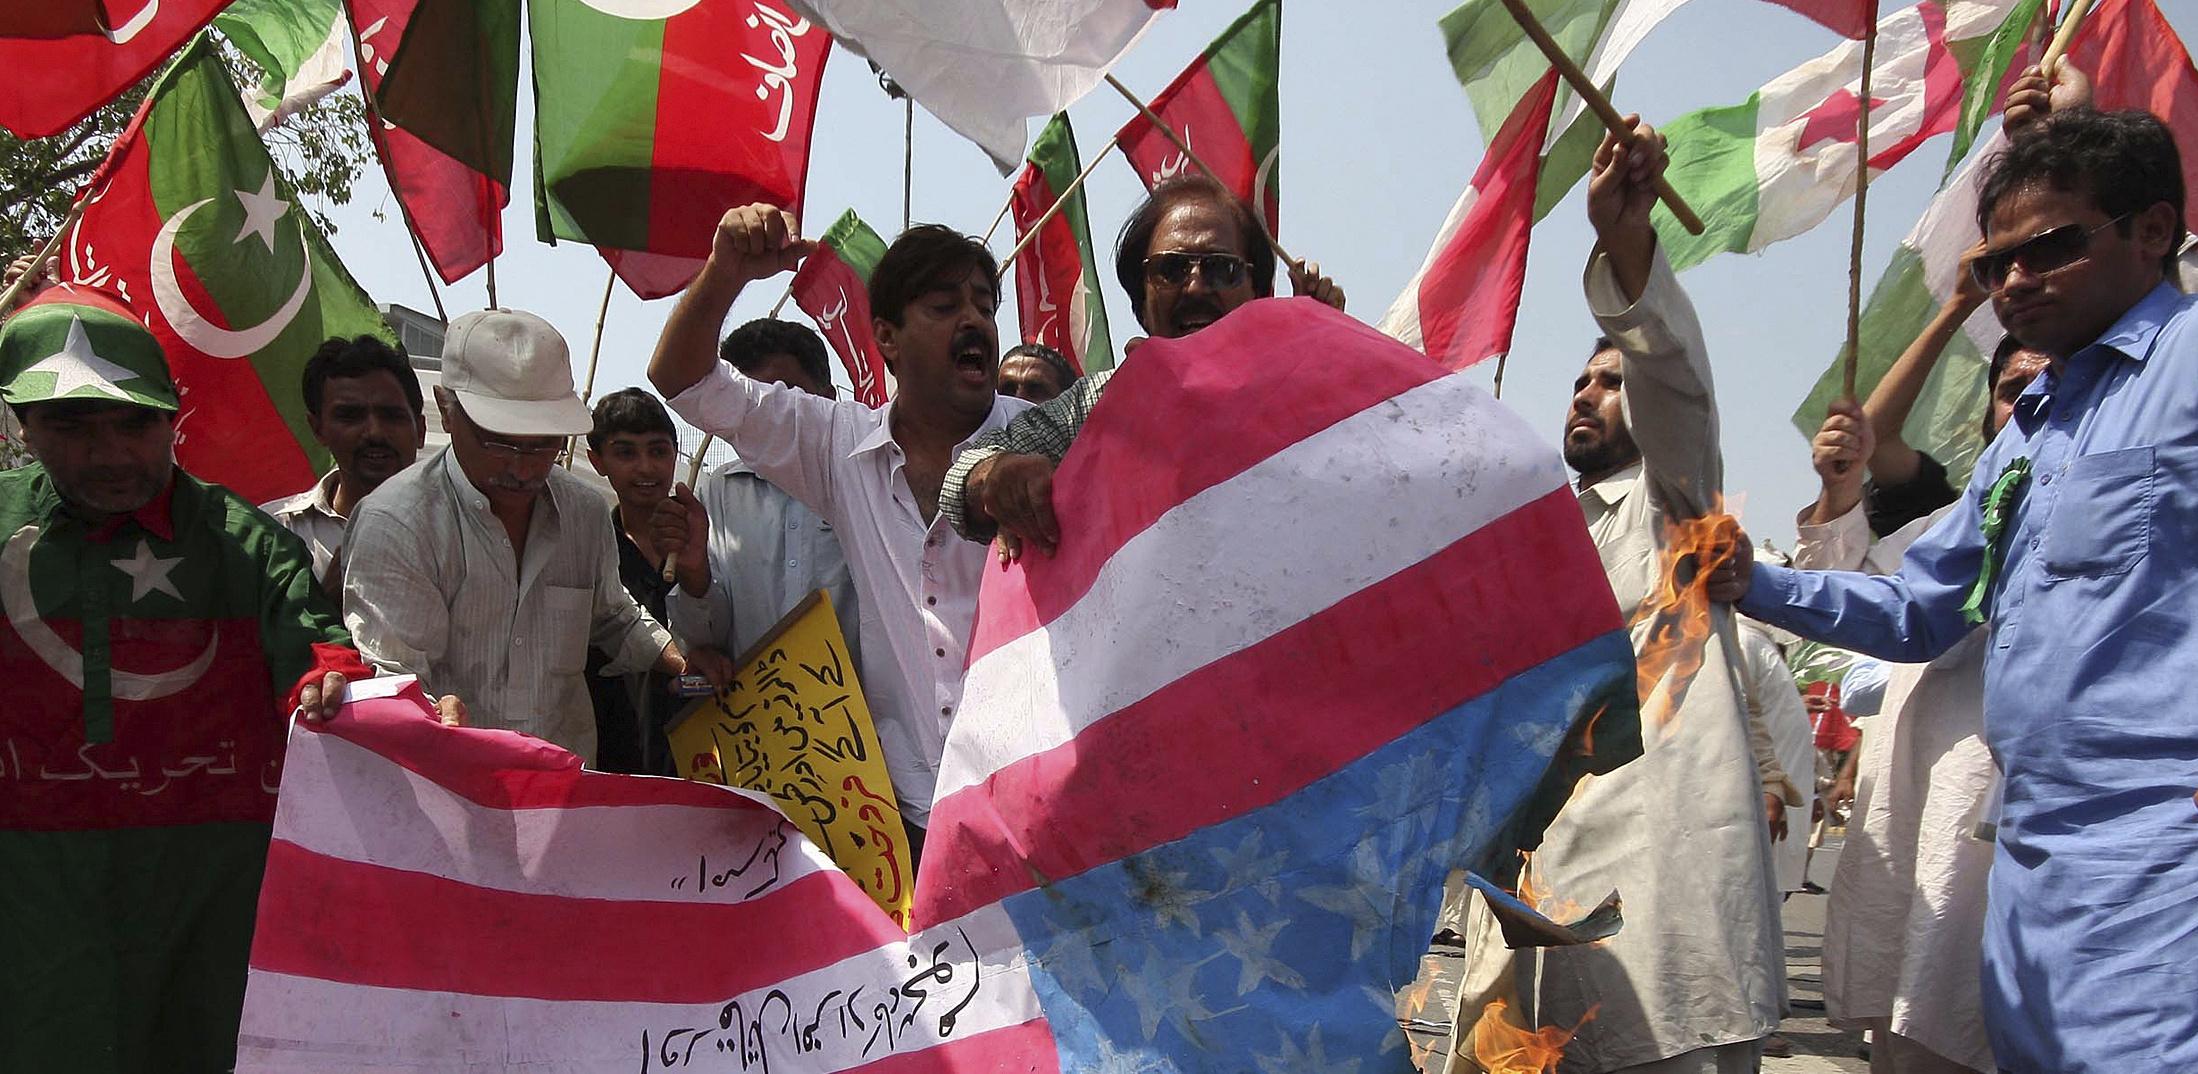 flagburningpakistan_bnr.jpg